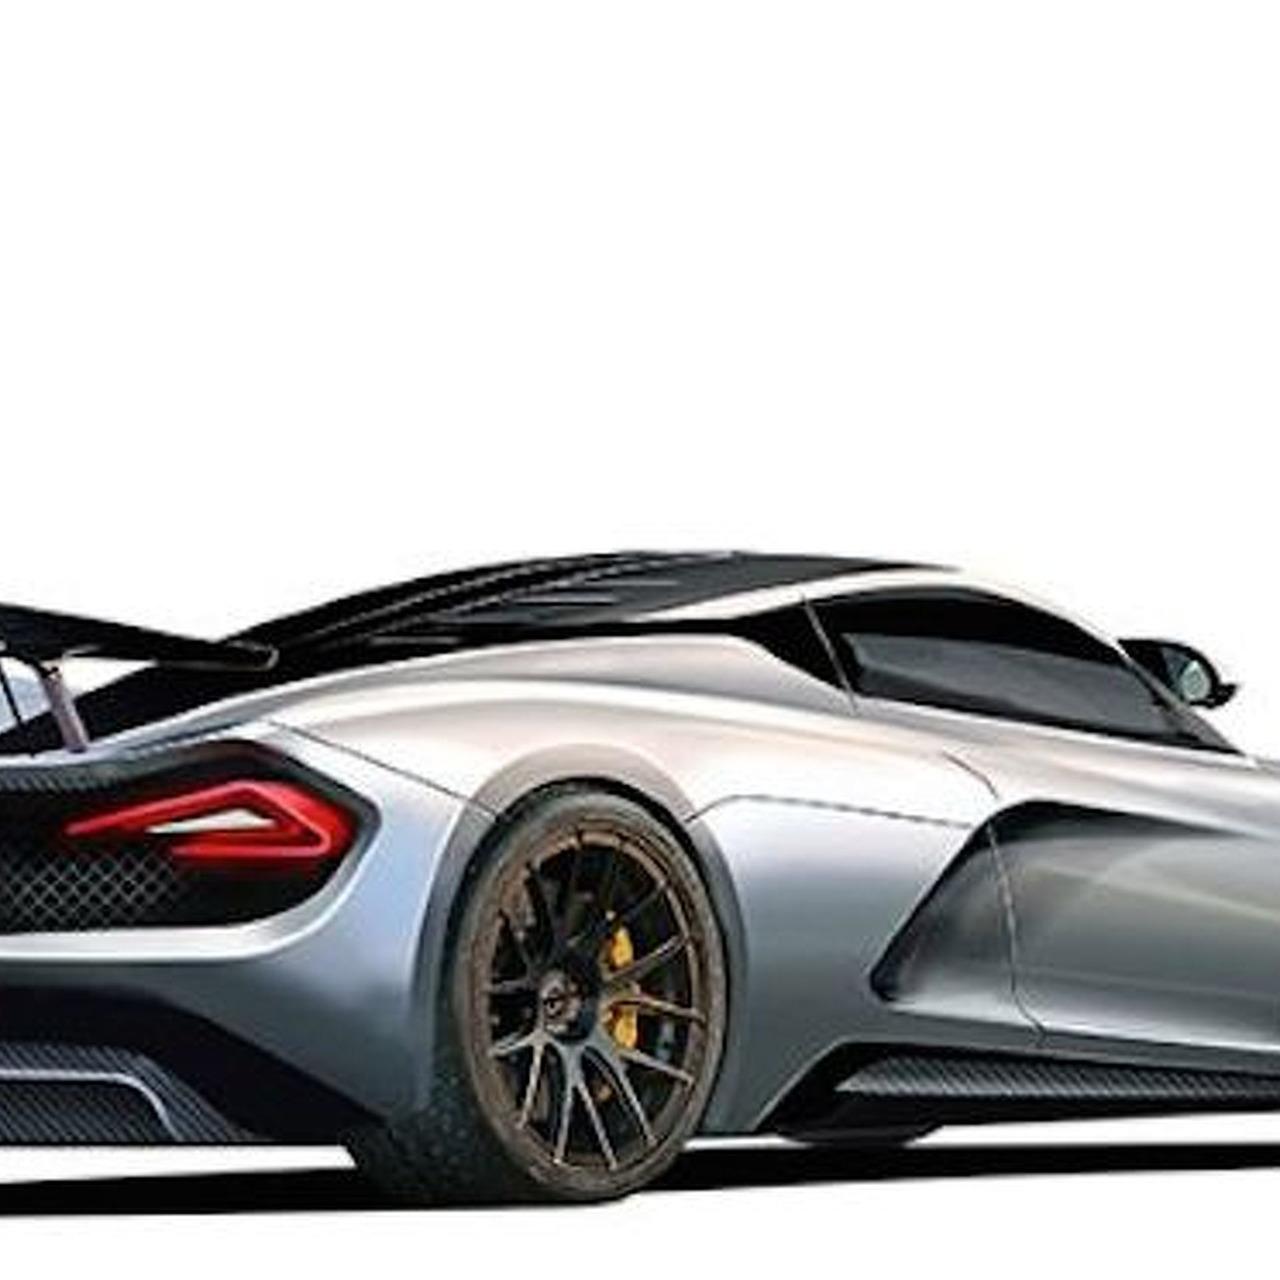 Hennessey Venom F5: America's 1,400HP, 290MPH Hypercar